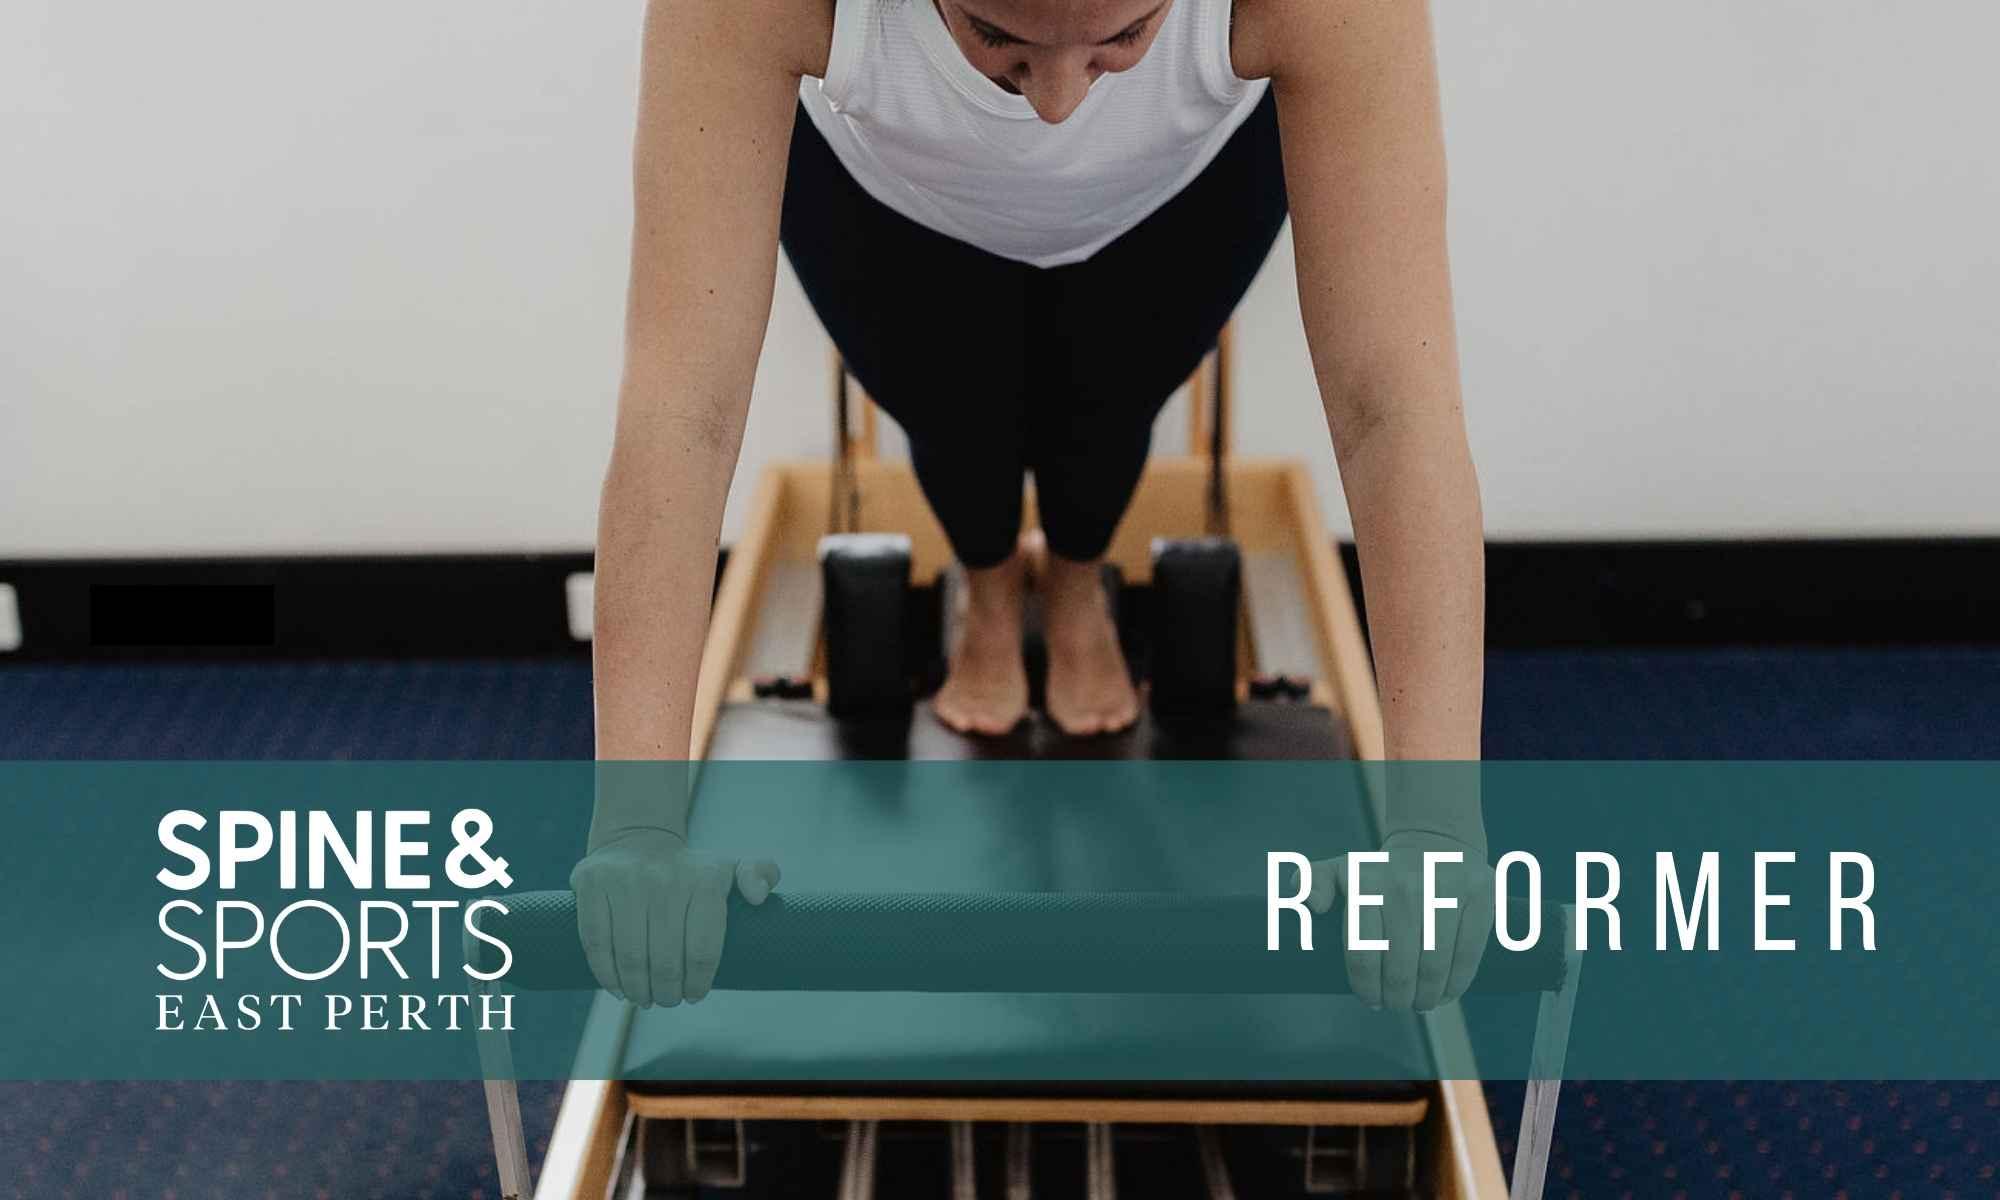 East Perth Reformer Pilates at Spine & Sports Centre.jpg